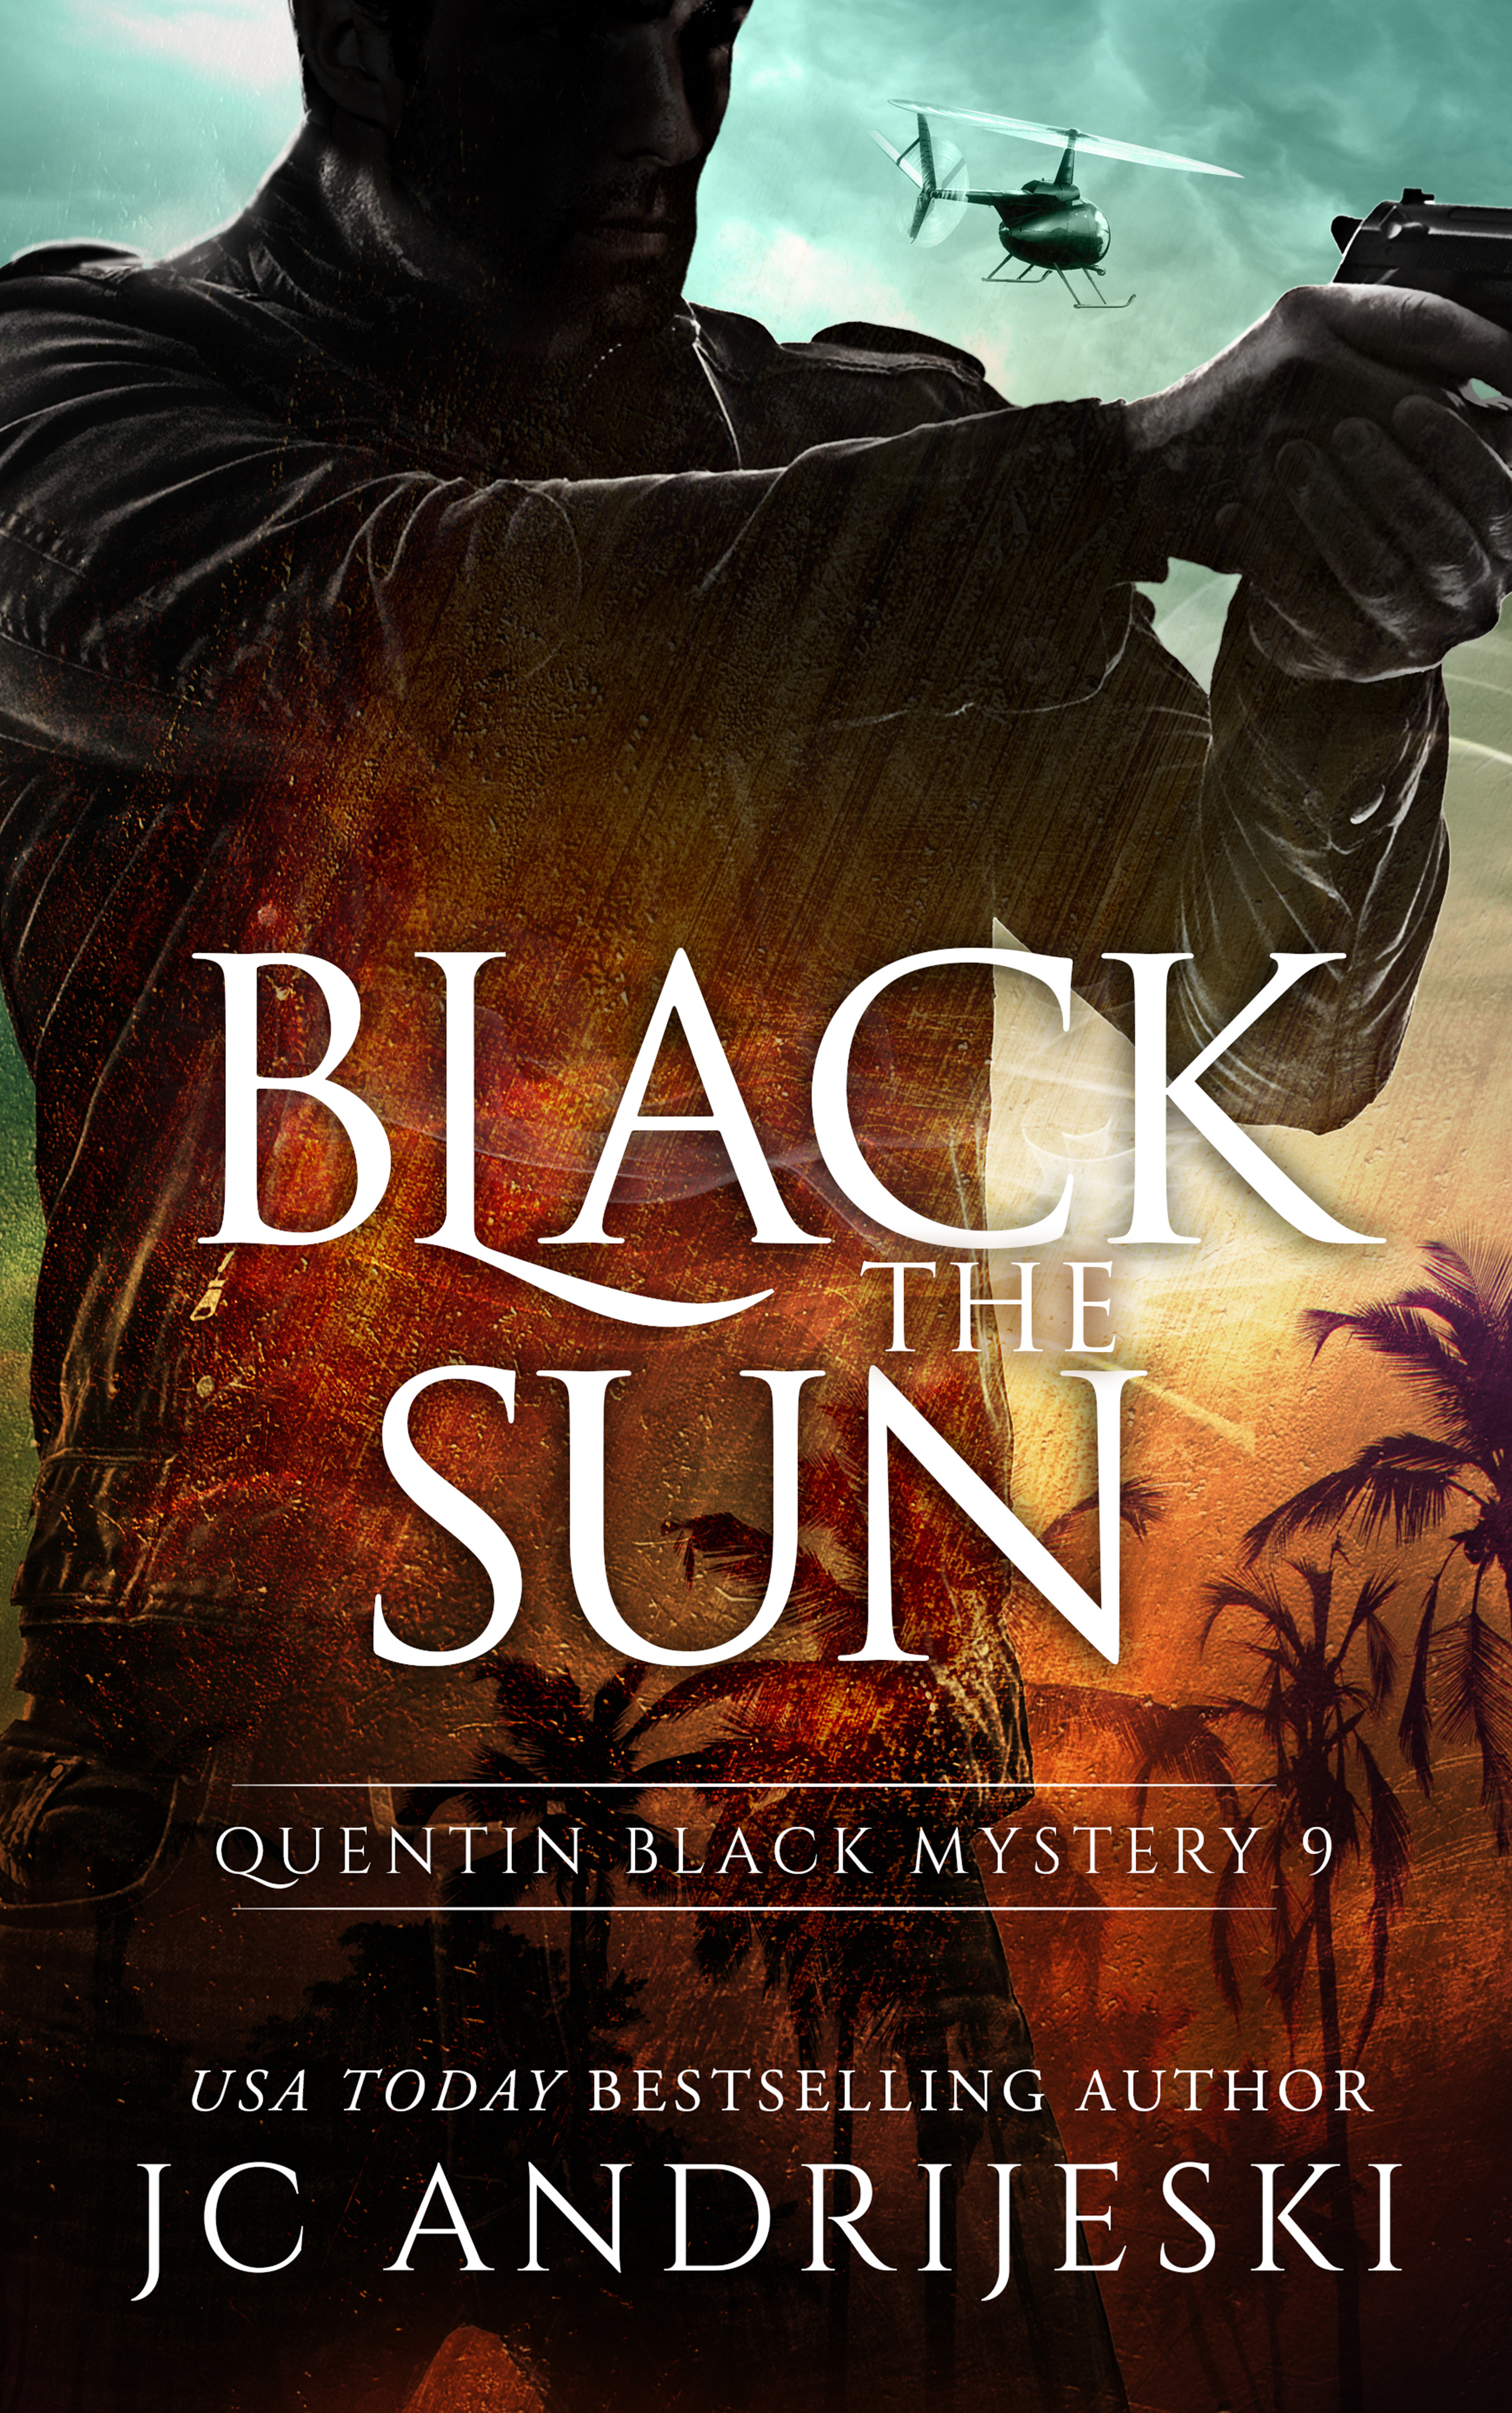 BLACK THE SUN